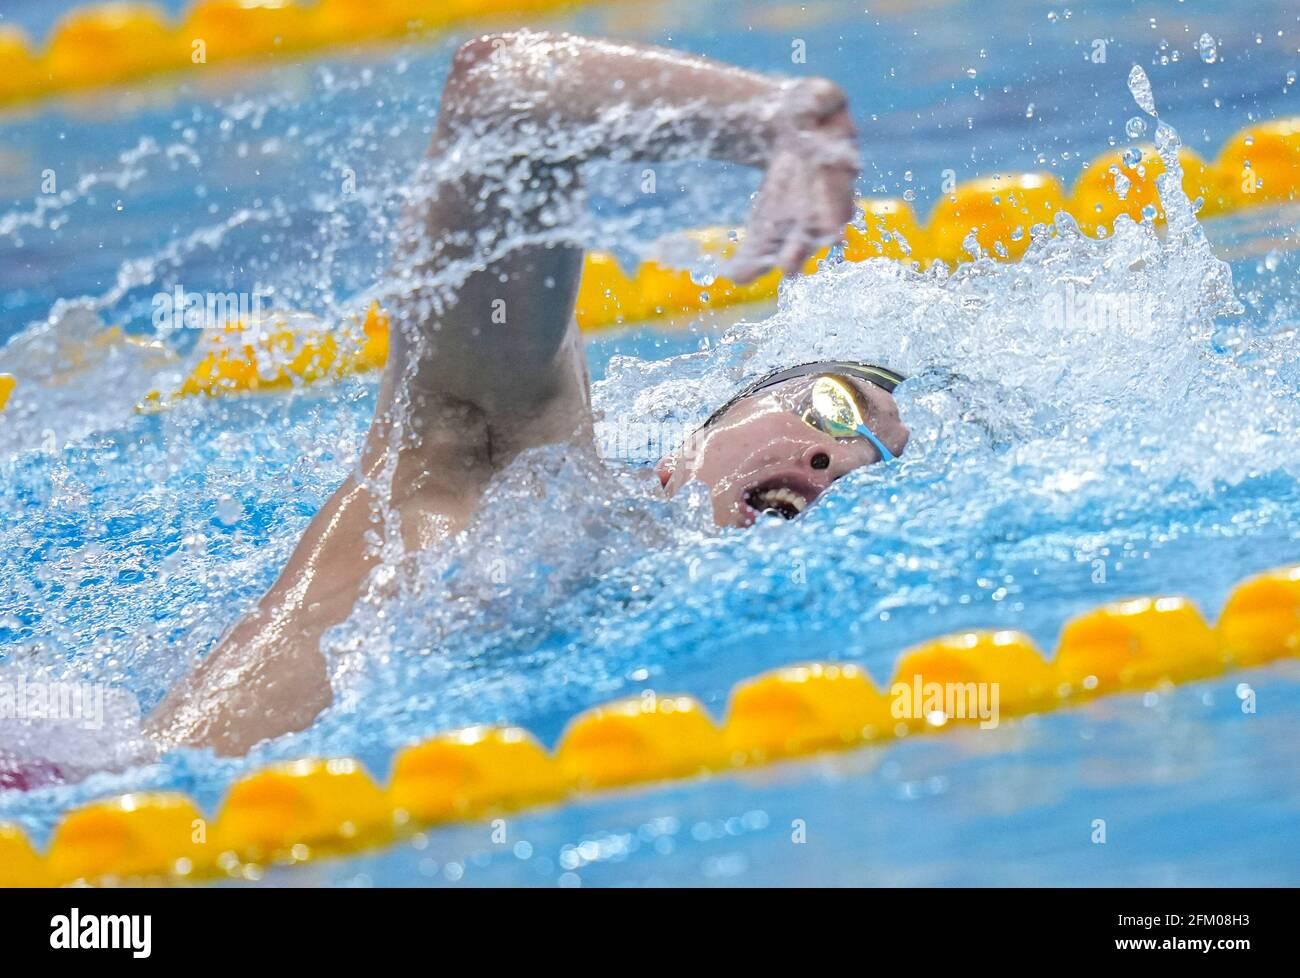 Qingdao, China. 5th May, 2021. Cheng Long of Shandong competes during the men's 800m freestyle final at the 2021 Chinese National Swimming Championships in Qingdao, east China, May 5, 2021. Credit: Xu Chang/Xinhua/Alamy Live News Stock Photo